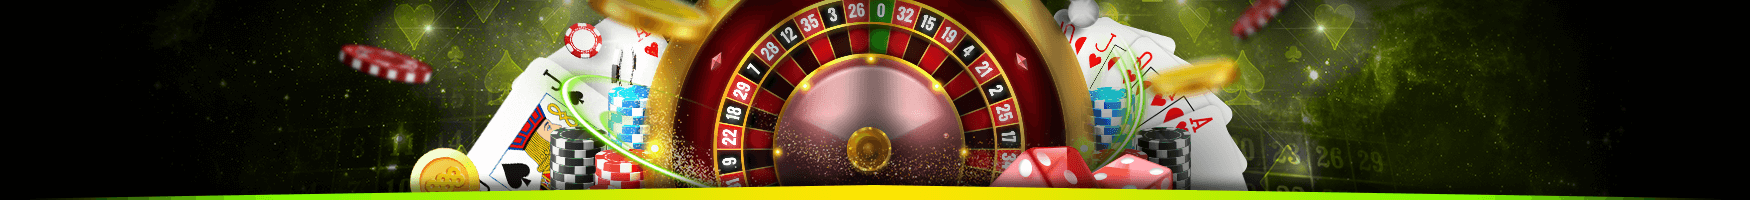 Juegos De Casino Gratis 888.Com